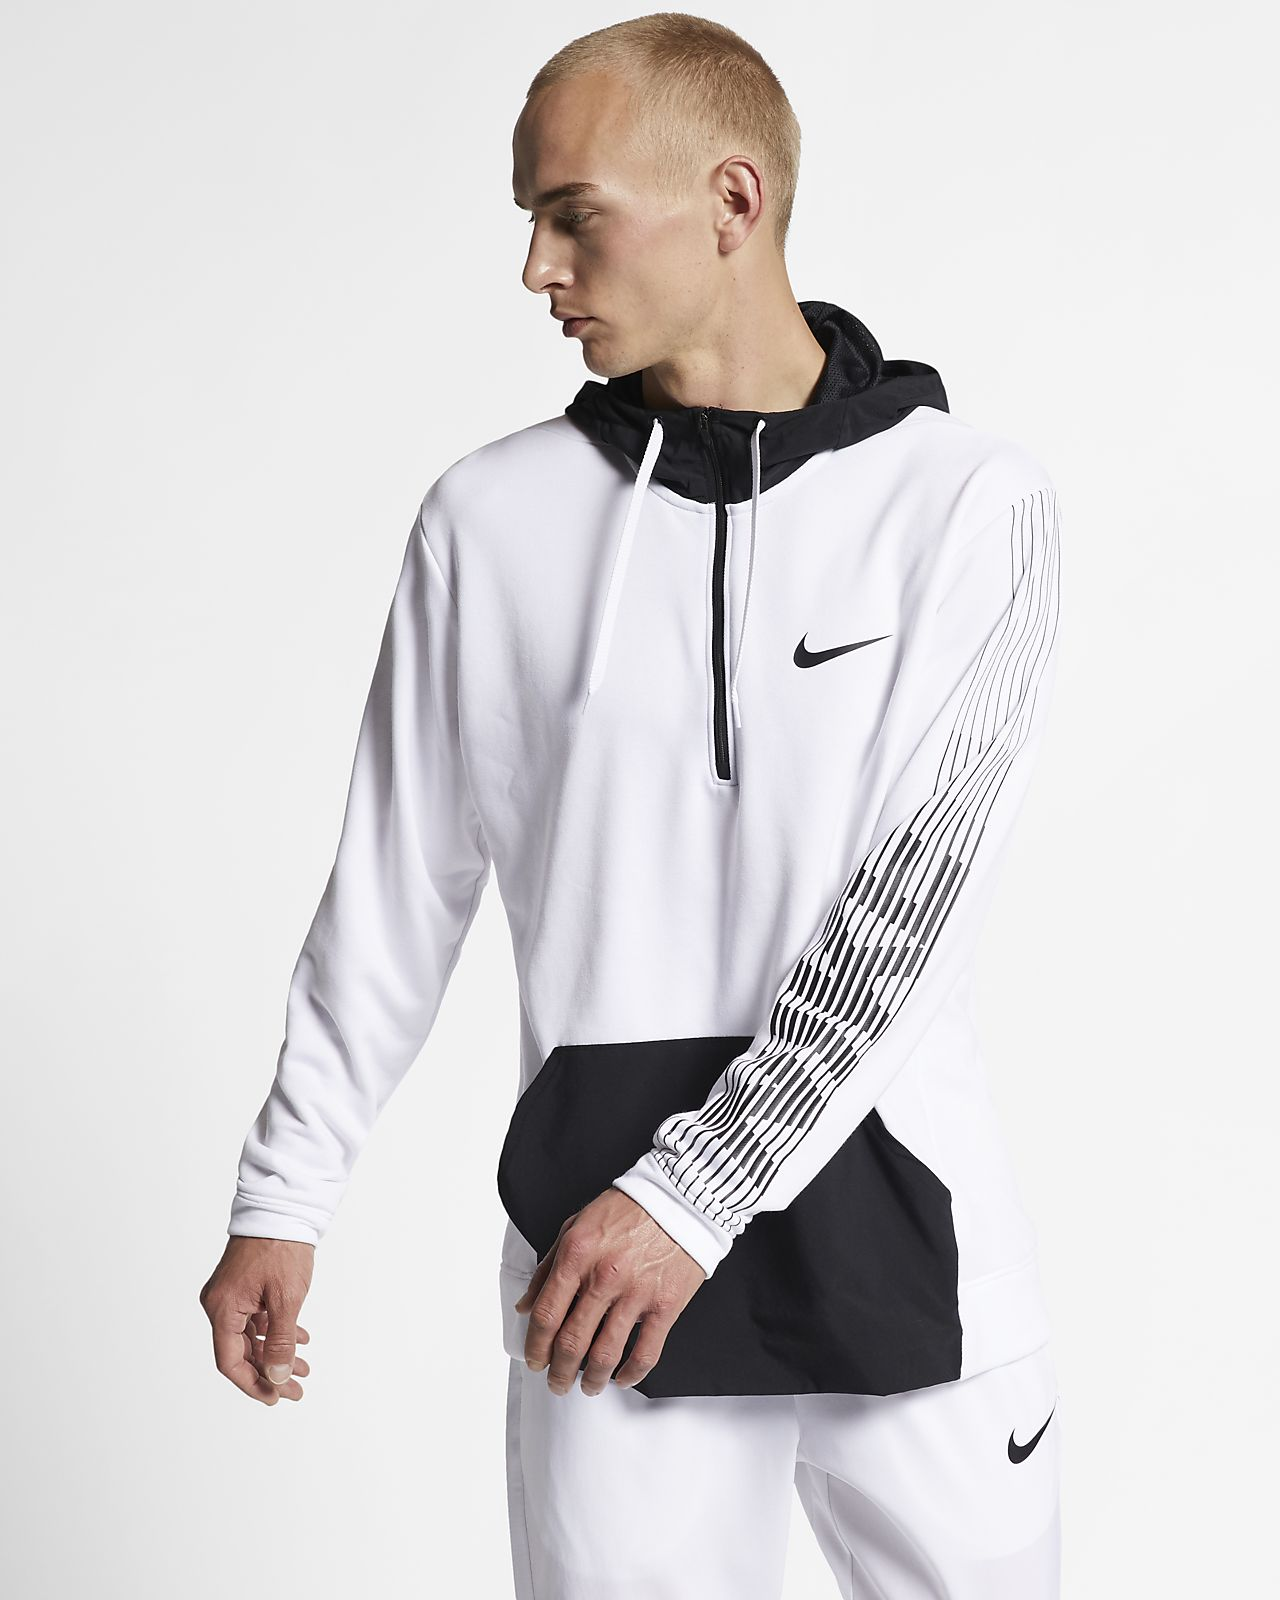 Nike Damen Sweatshirt Schwarz Sale